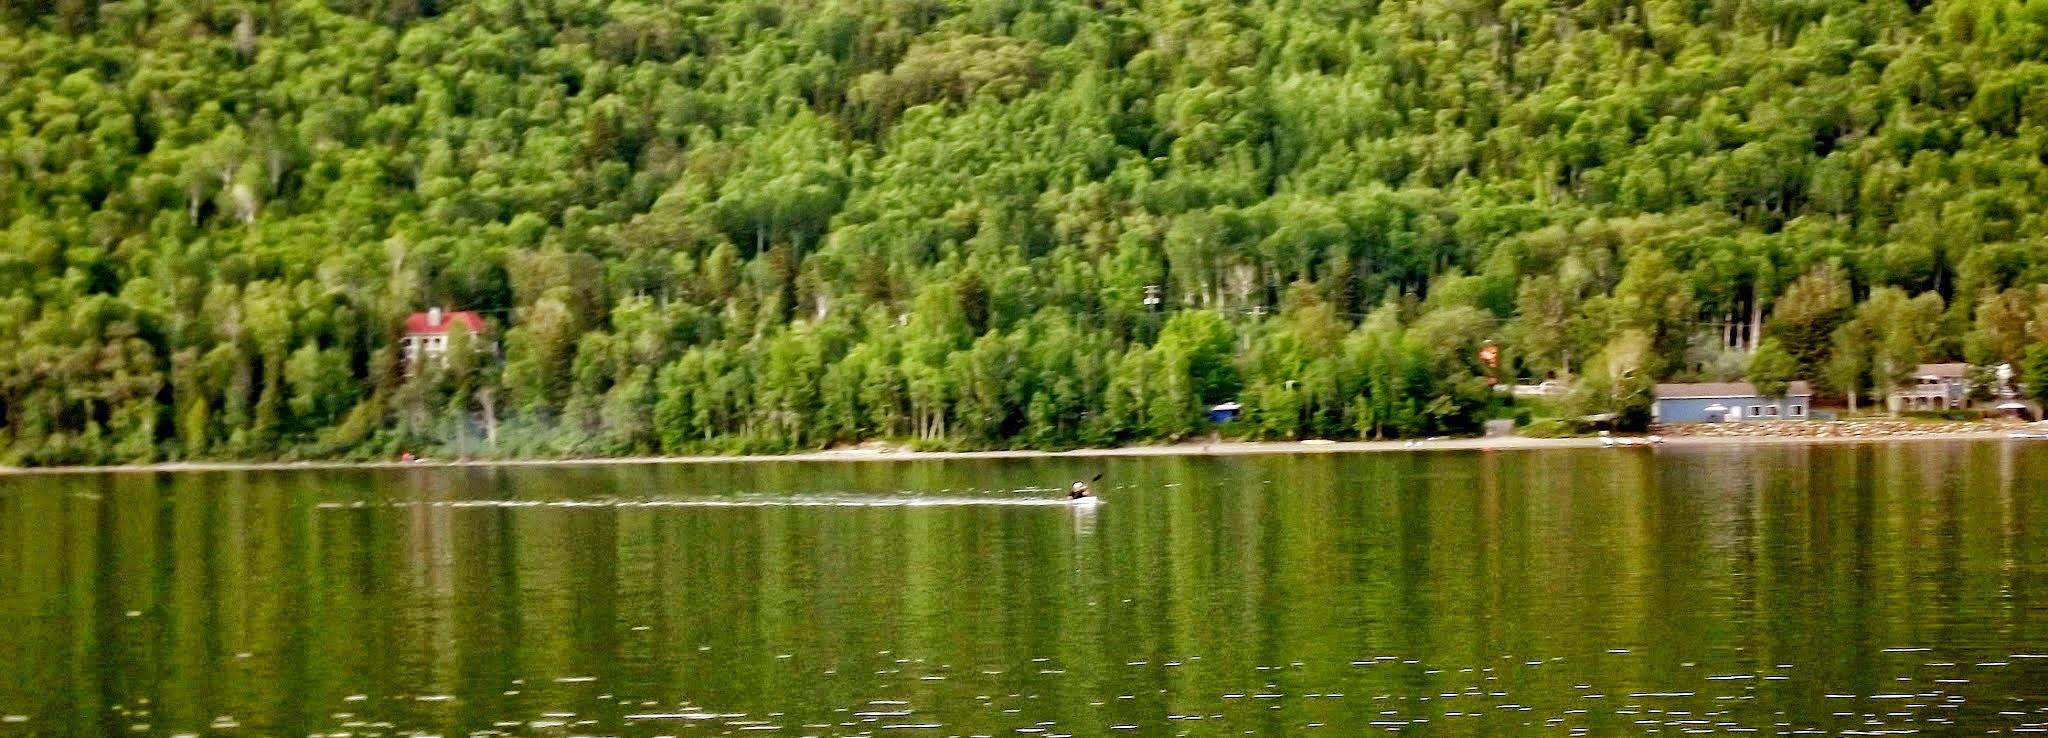 Kayak rider on the lake by real.michaud.5036